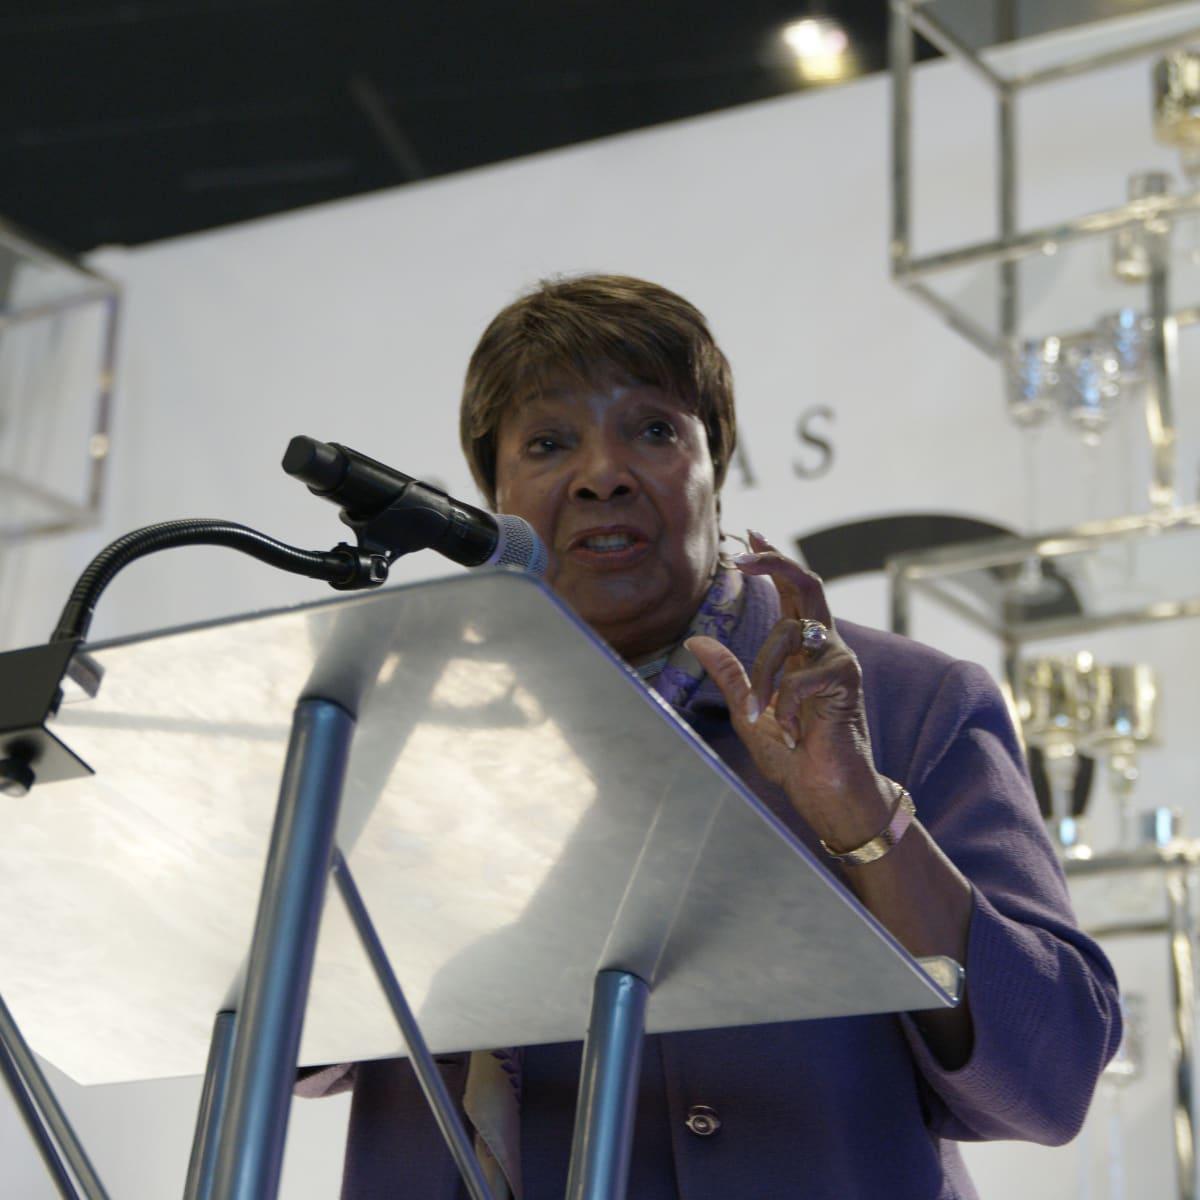 U.S. Rep. Eddie Bernice Johnson, Millennial Gala 2017